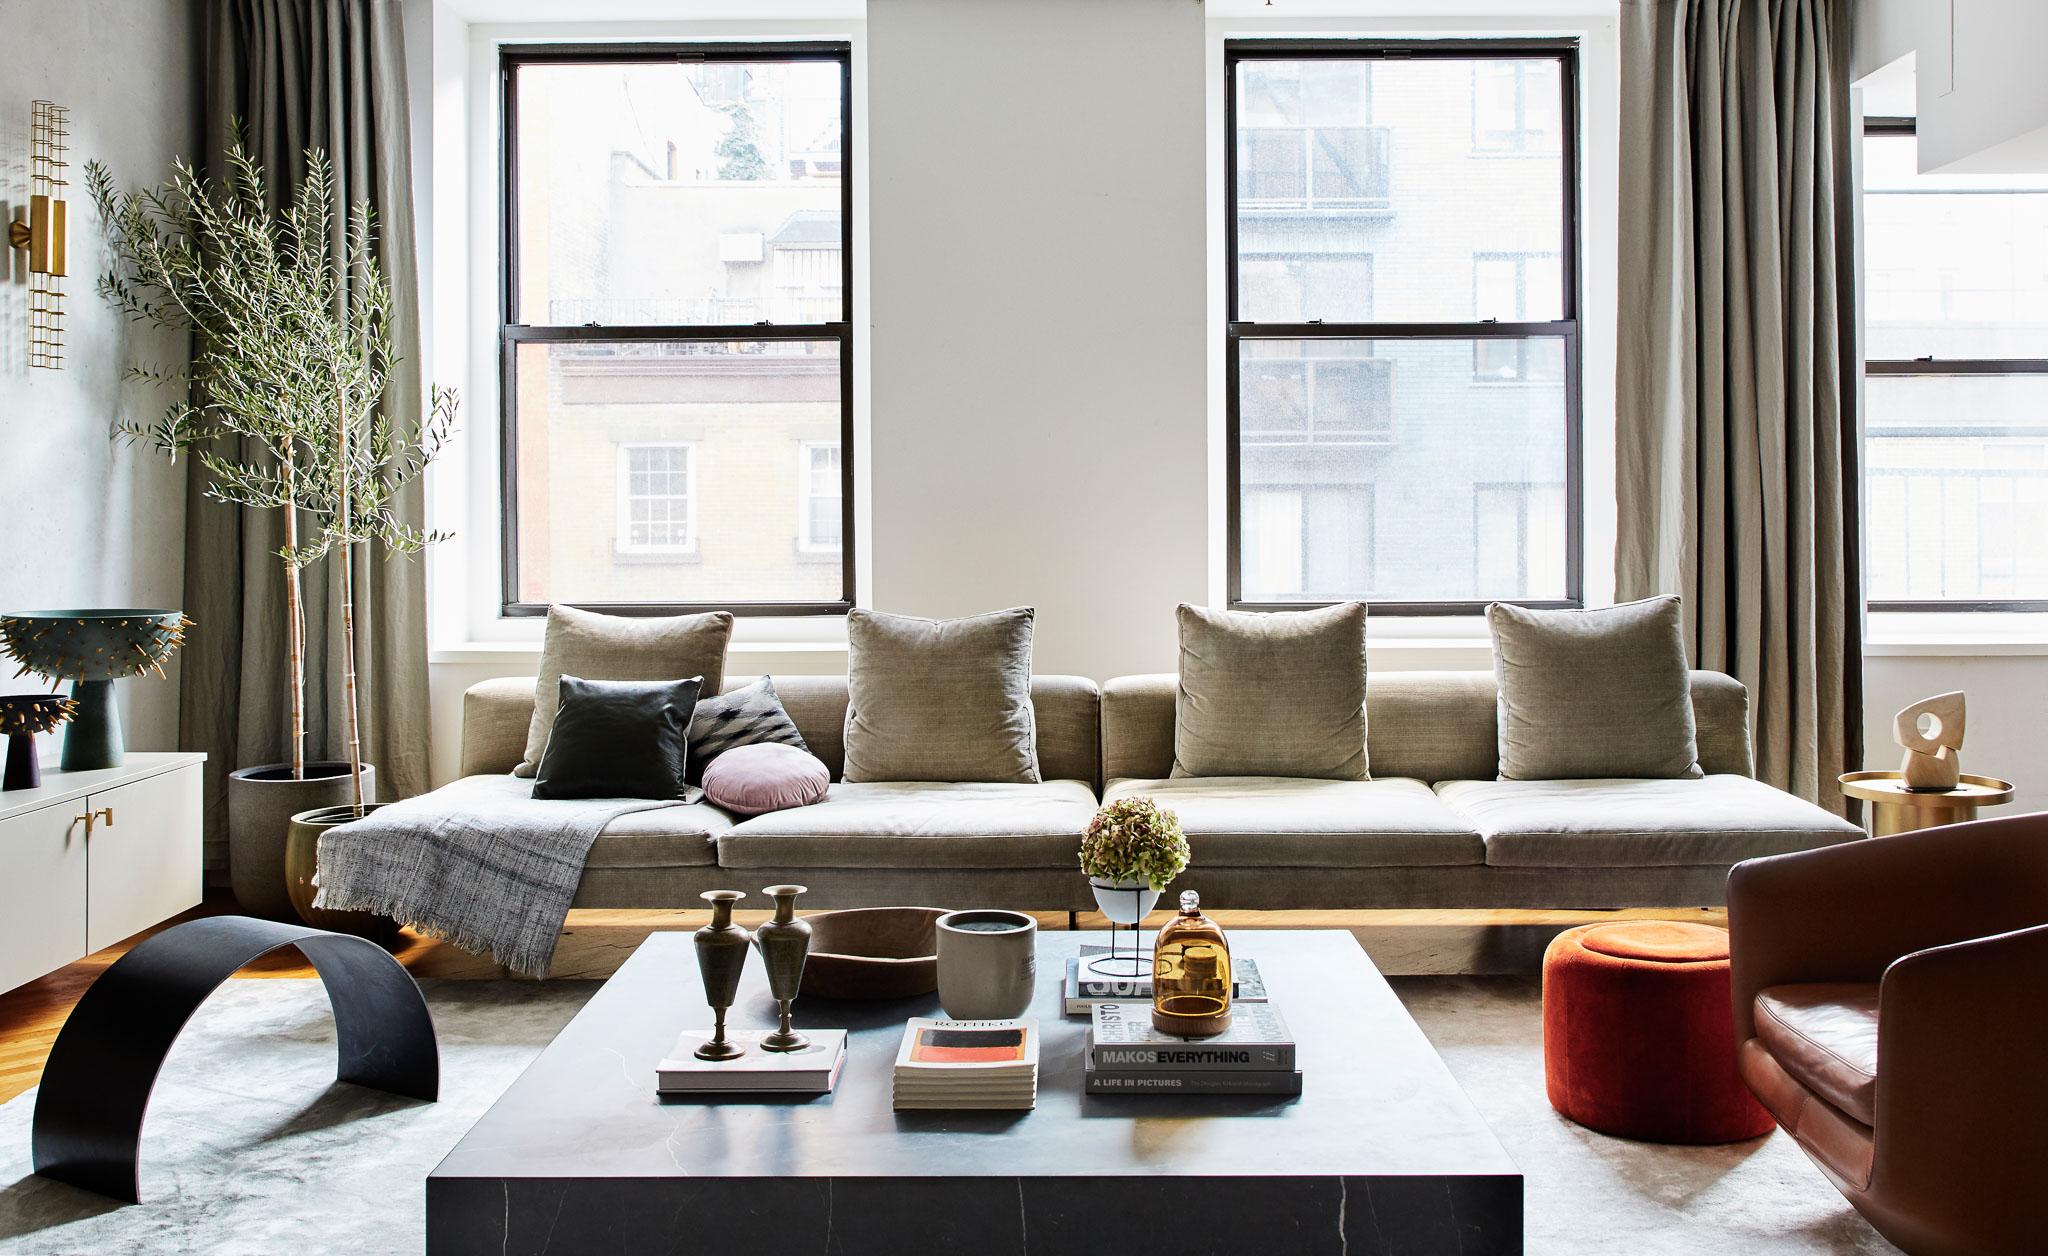 Designer Tali Roth Talks About Decorating Her Chelsea Loft | StreetEasy